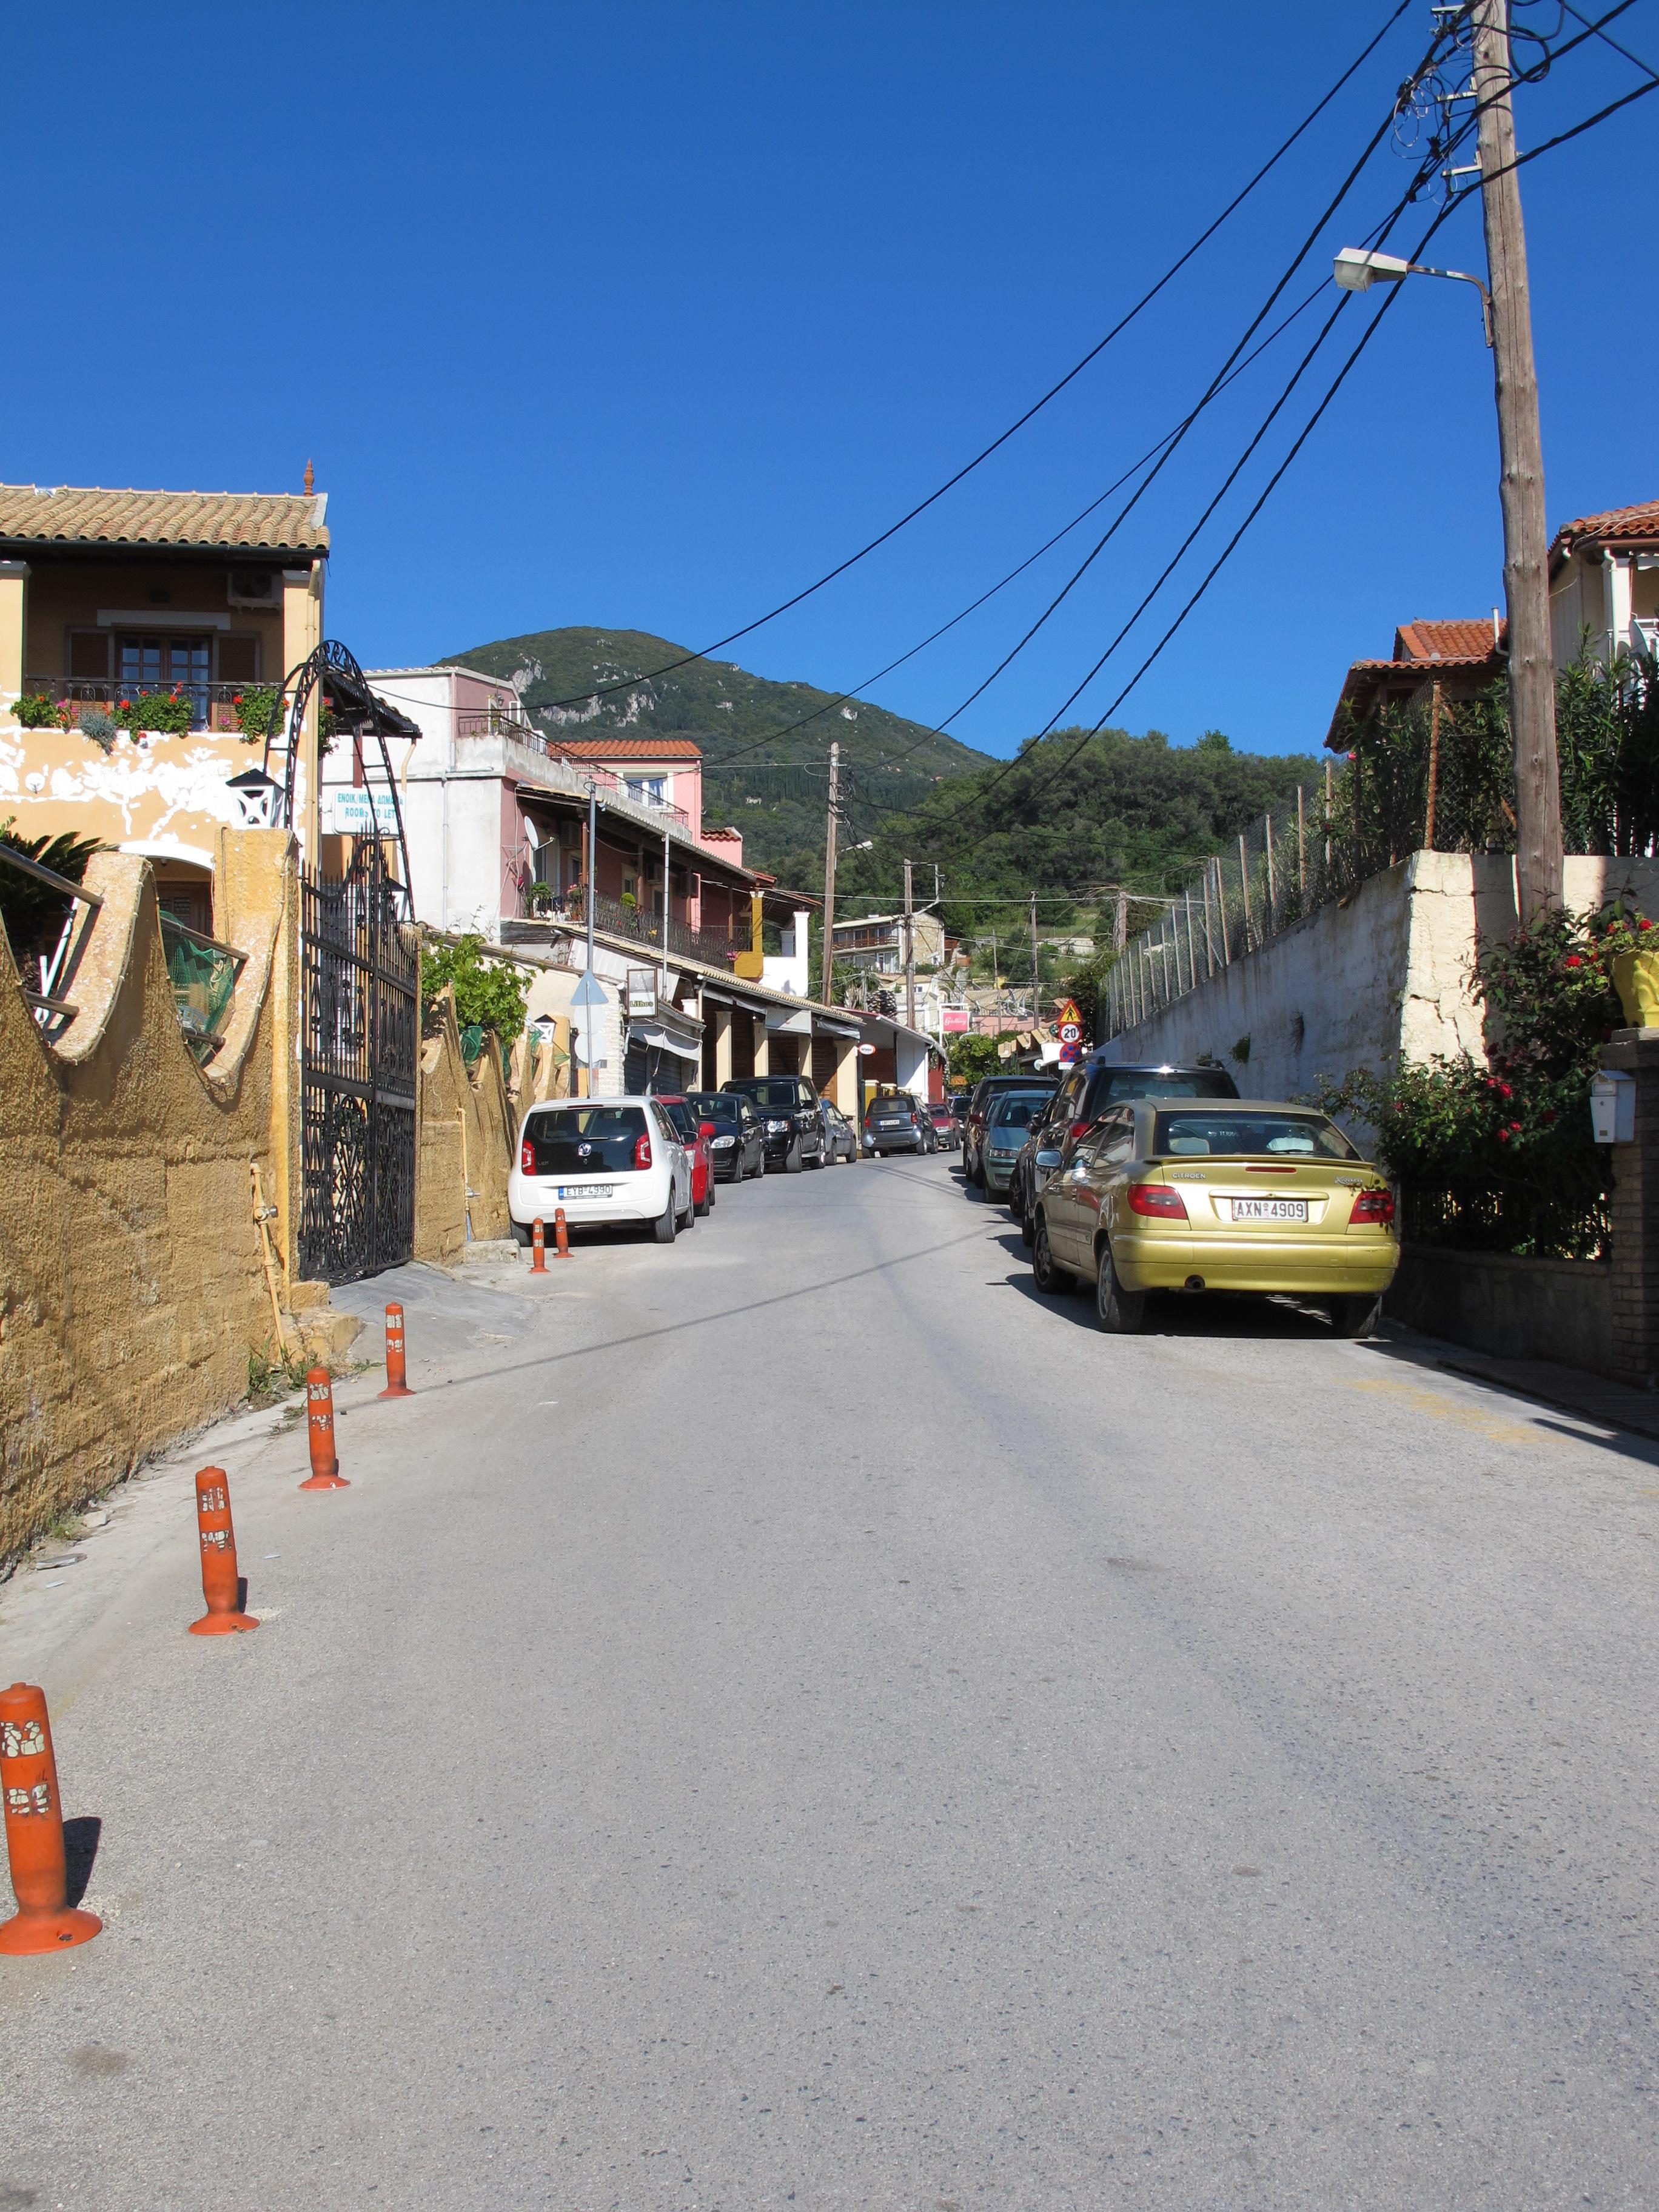 File:Straßenszene in Agios Gordios 01.jpg - Wikimedia Commons